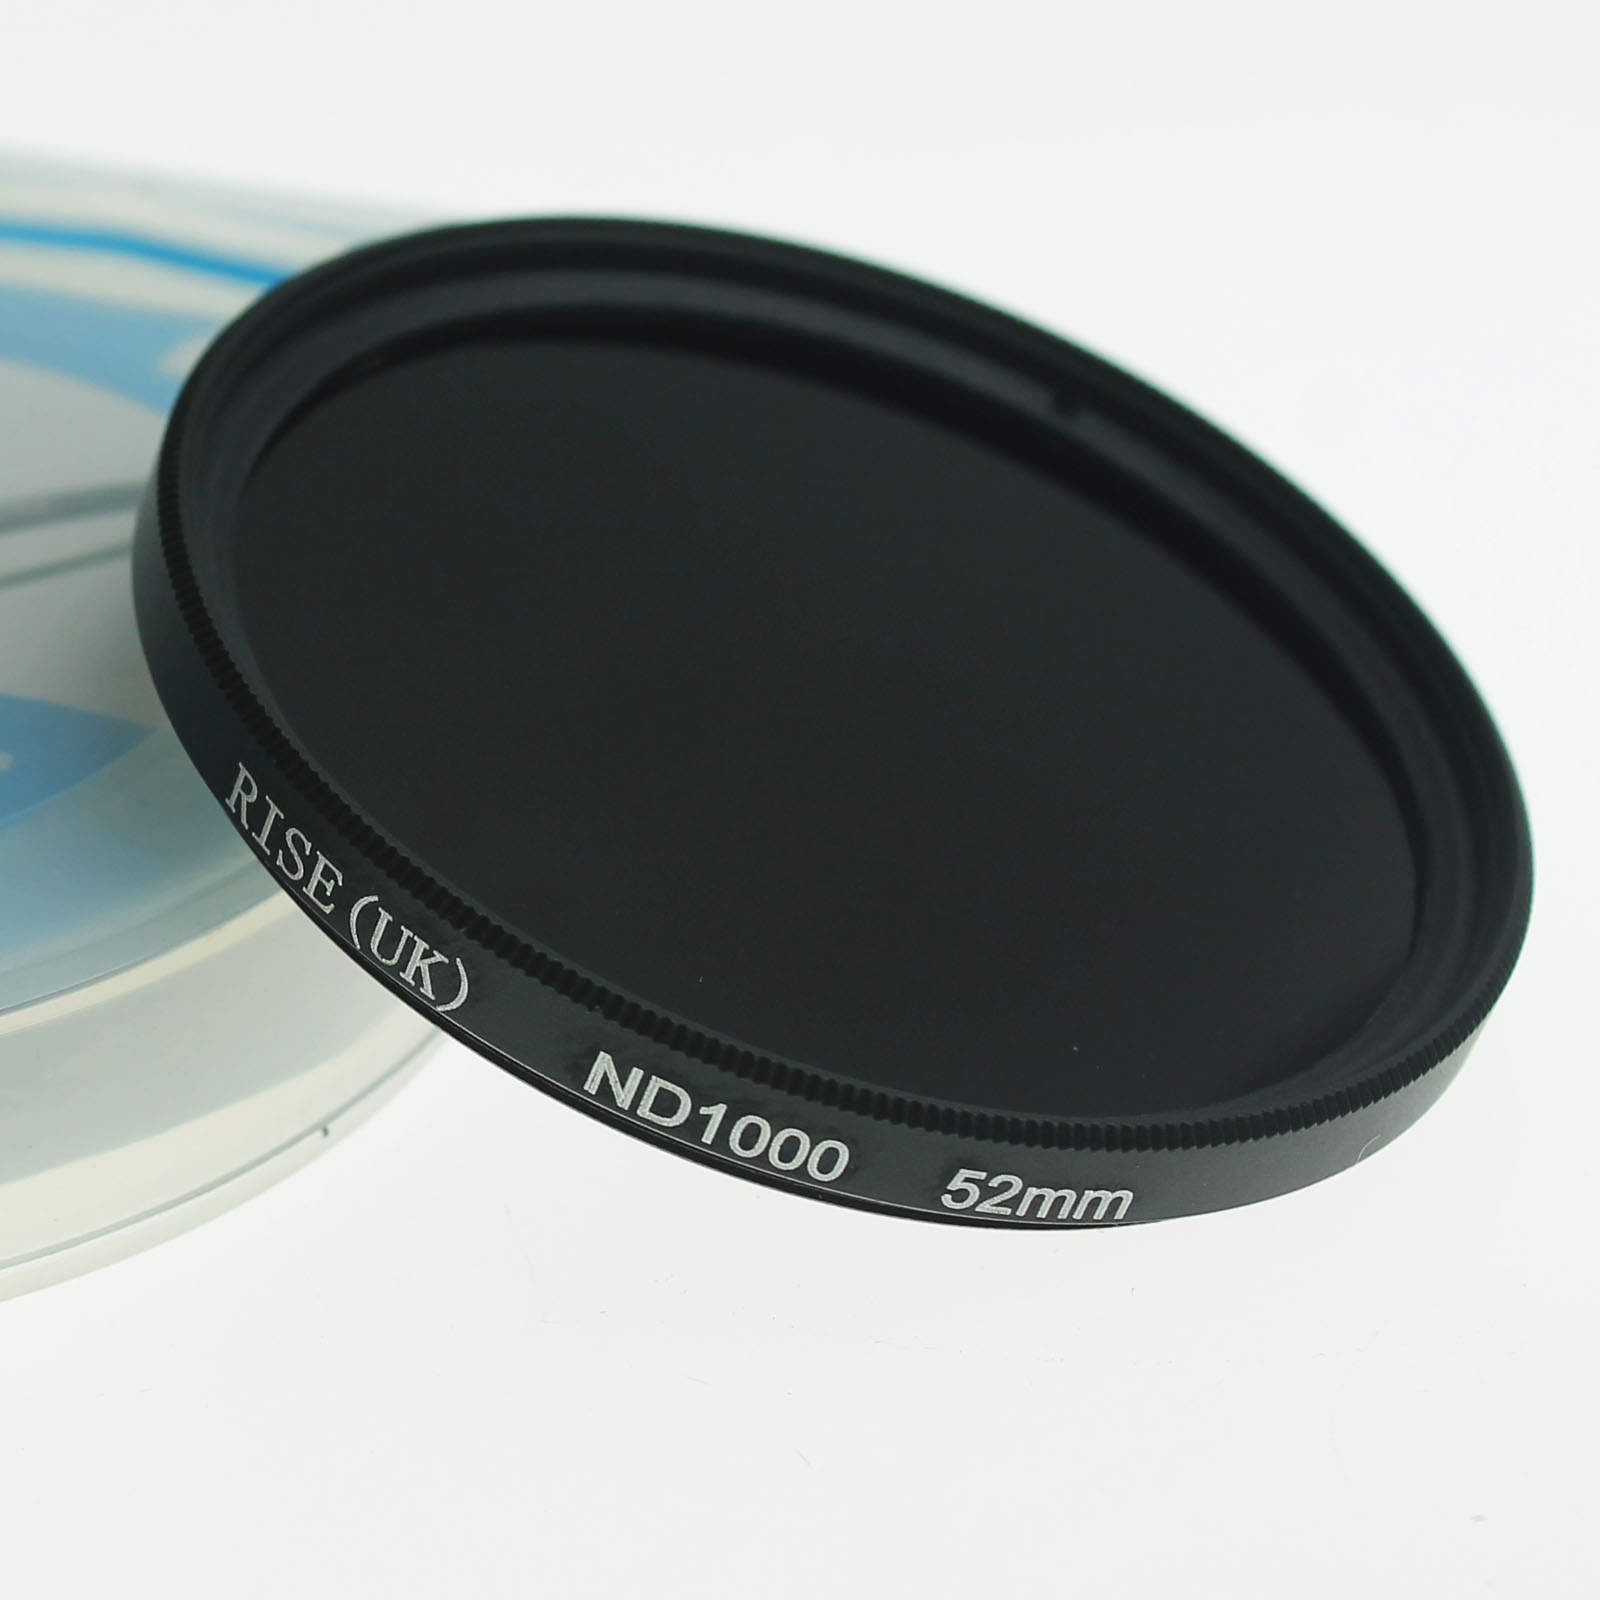 RISE 52mm slim Neutral density optical grade ND ND1000 filter for digital camera lens DVRISE 52mm slim Neutral density optical grade ND ND1000 filter for digital camera lens DV